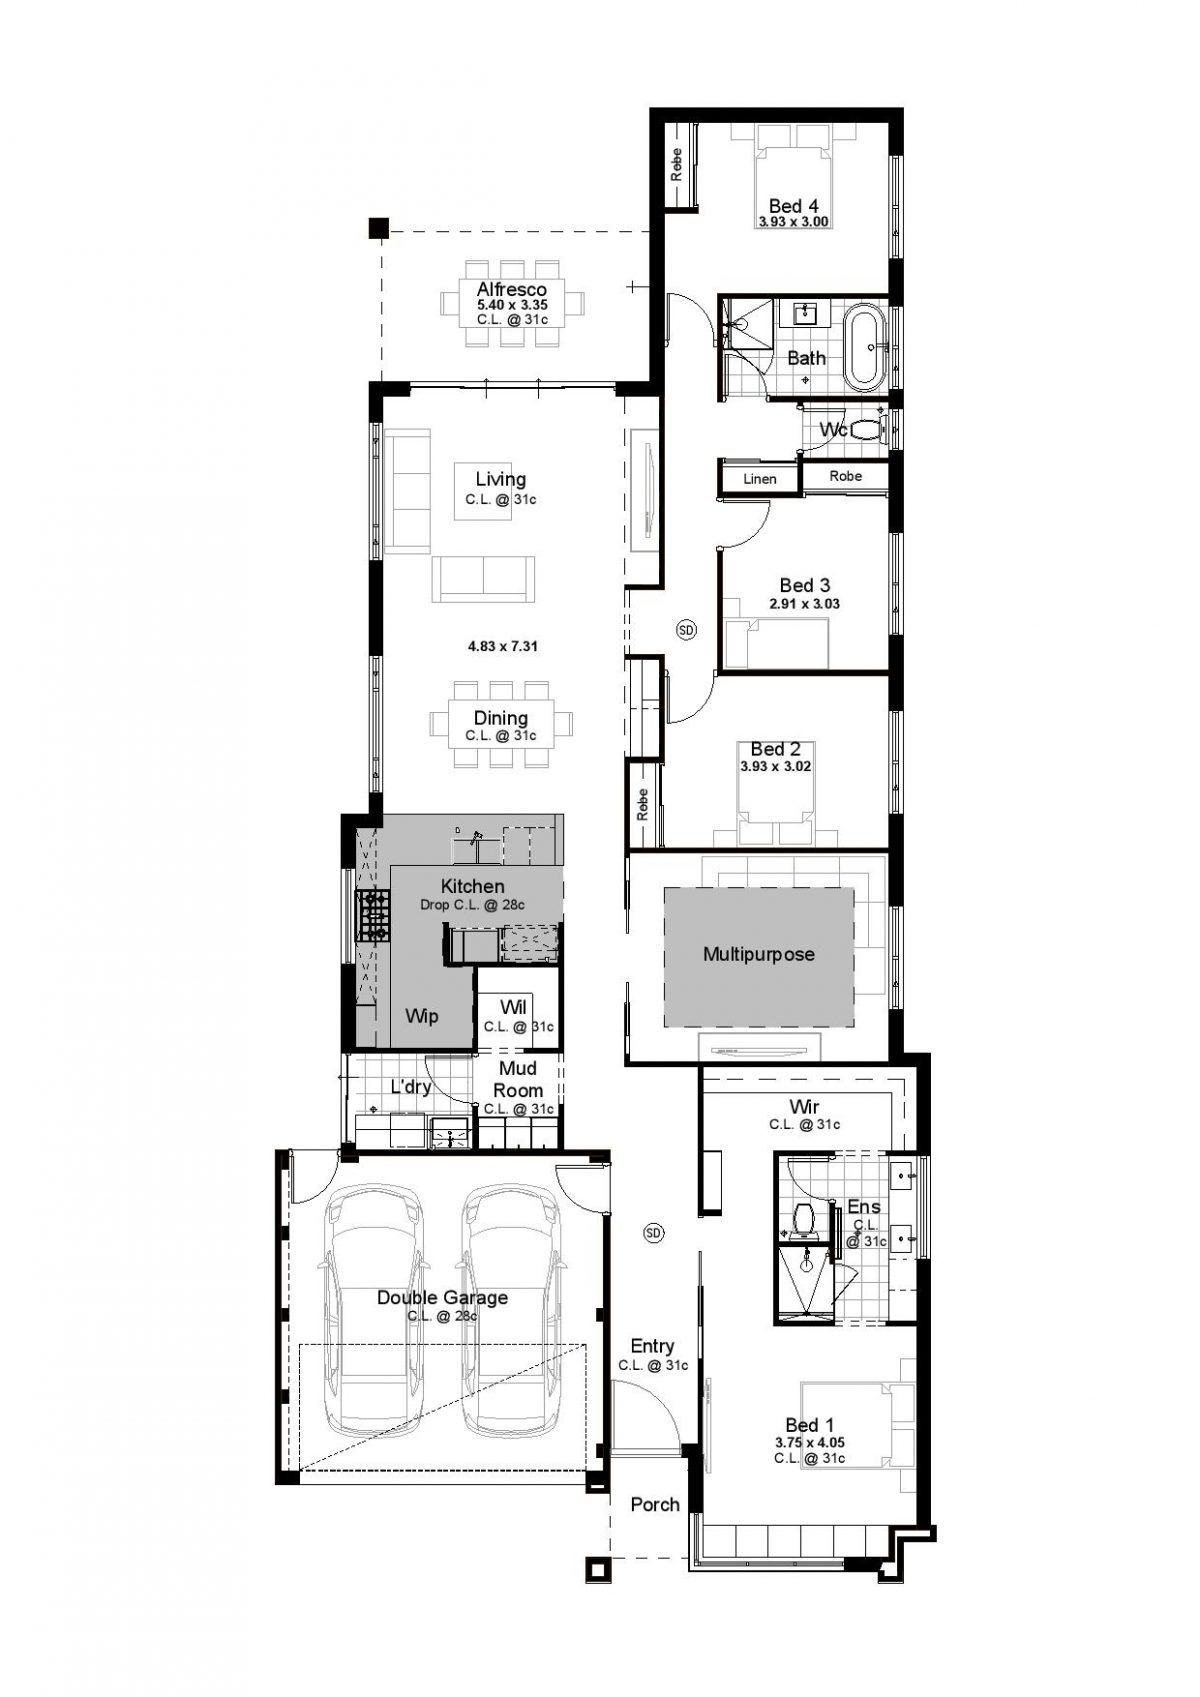 Grayson Inspired Homes 4 Bedroom House Plans Home Design Floor Plans Bedroom House Plans